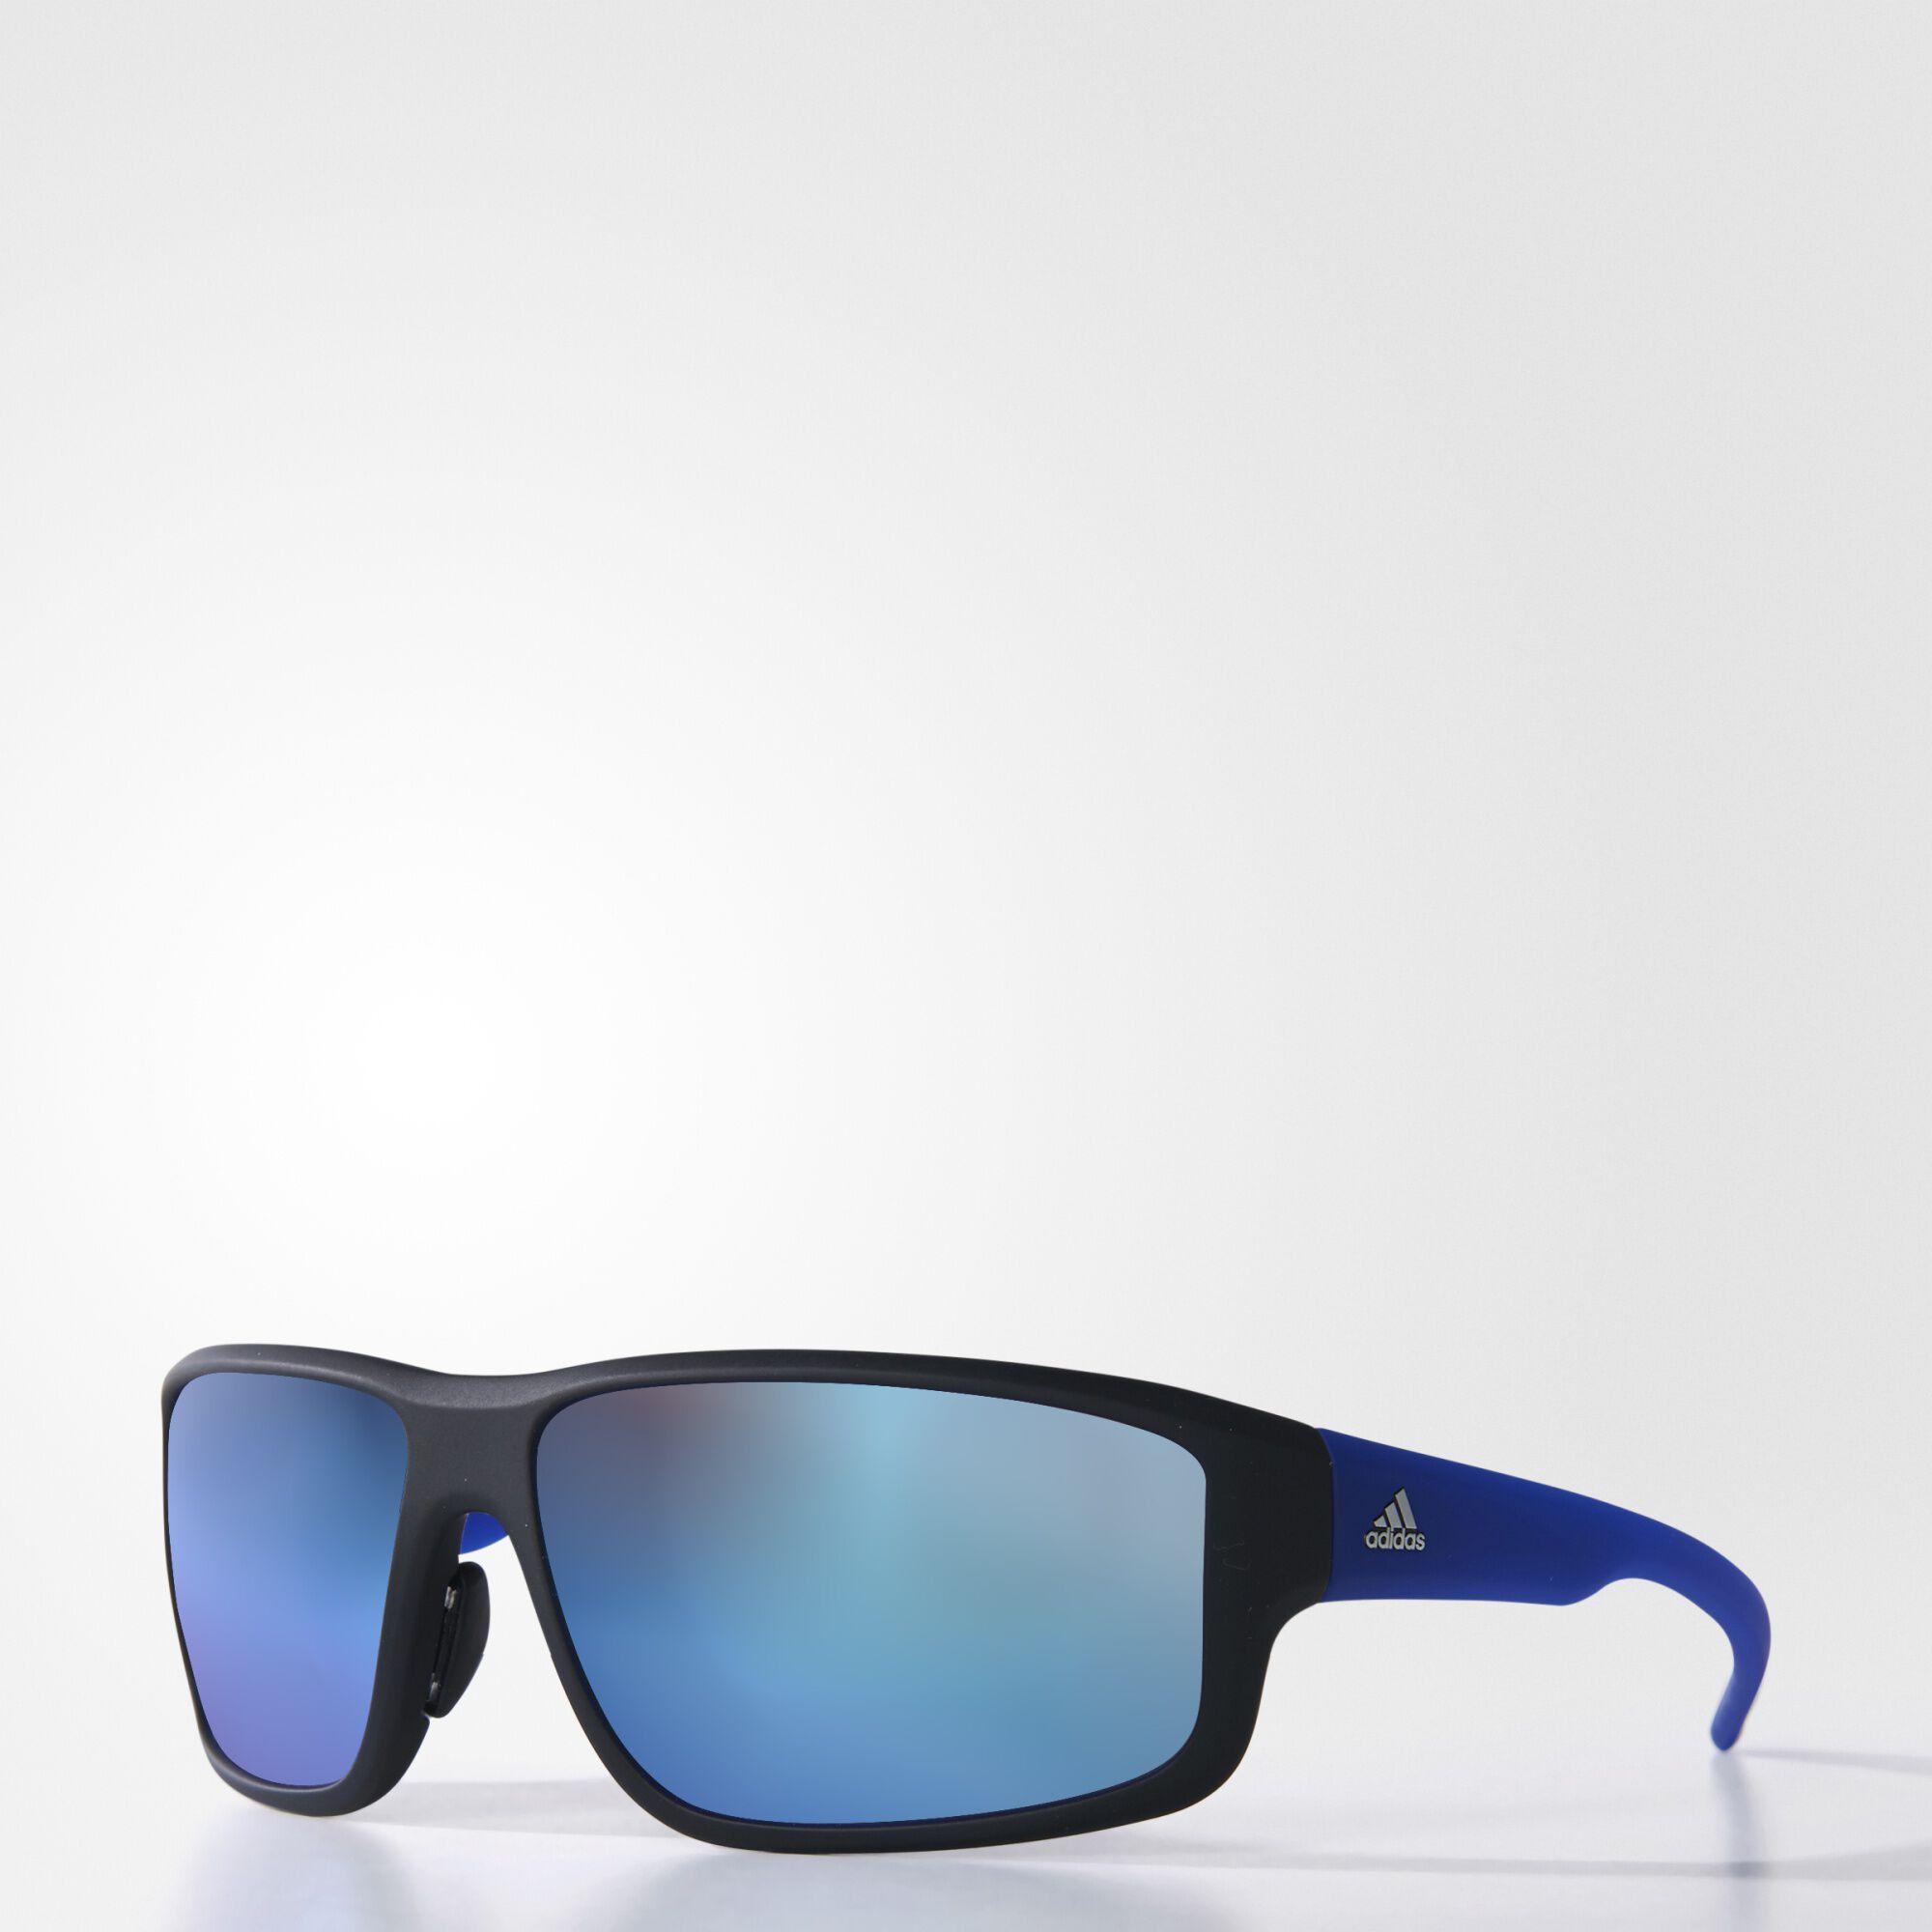 66c9c46e95 Adidas Kumacross Sunglasses Review